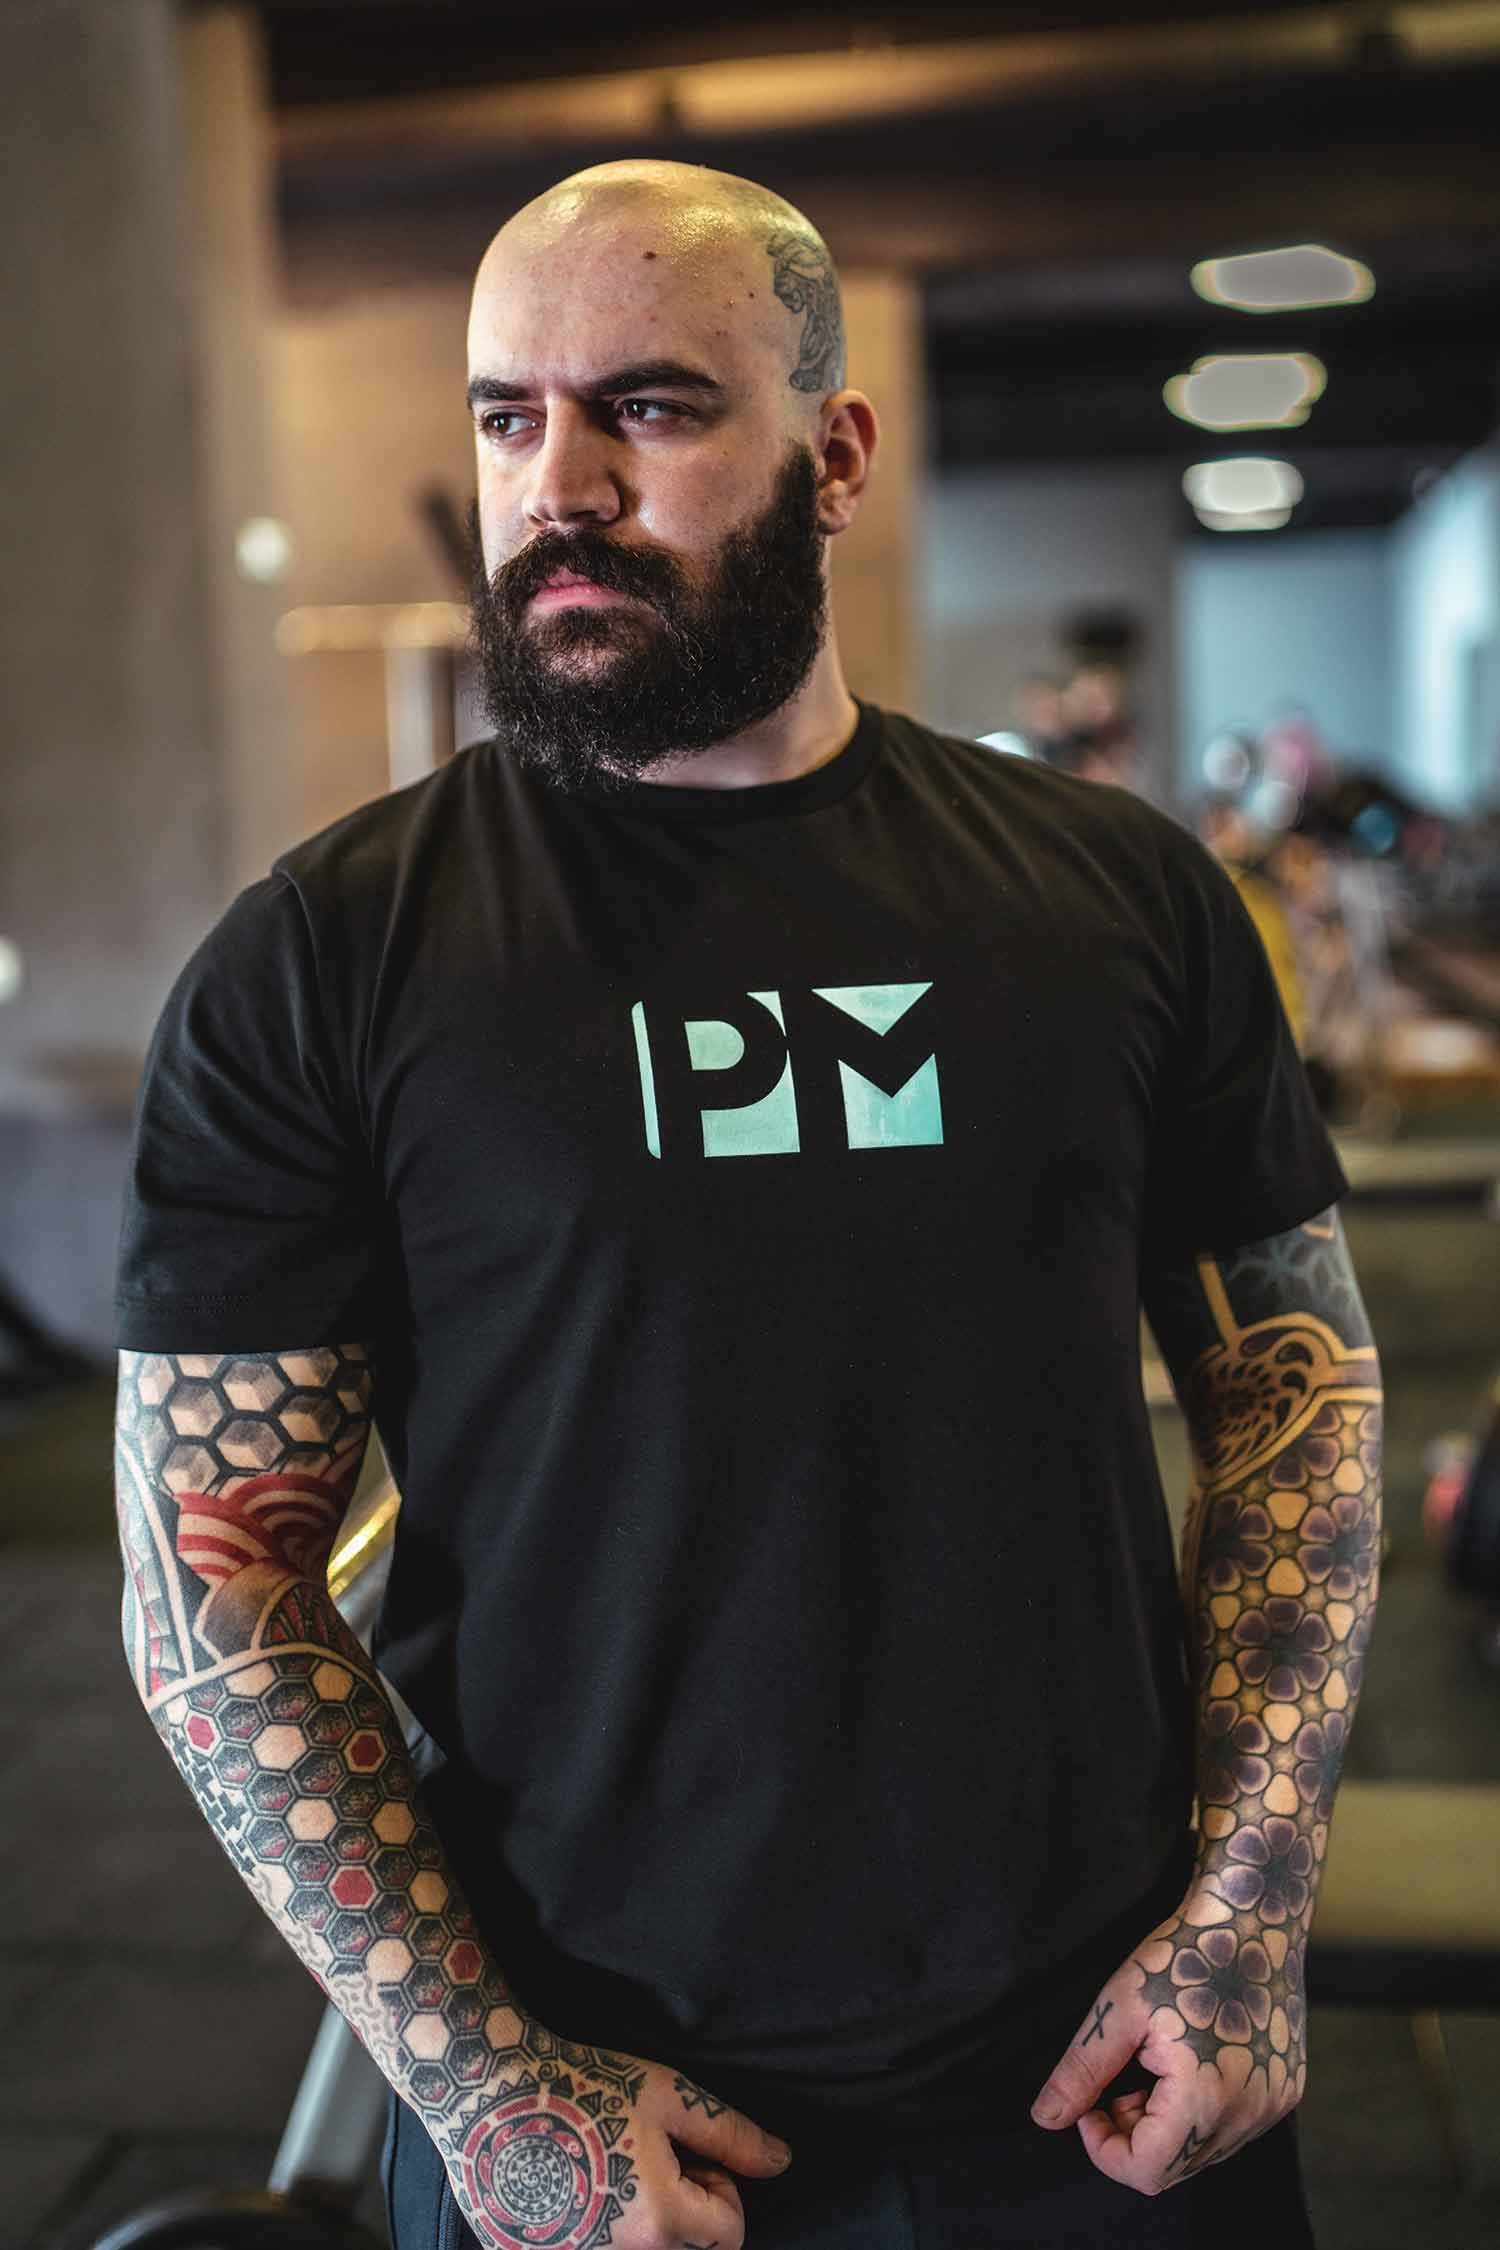 PM classic northern lights t-shirt